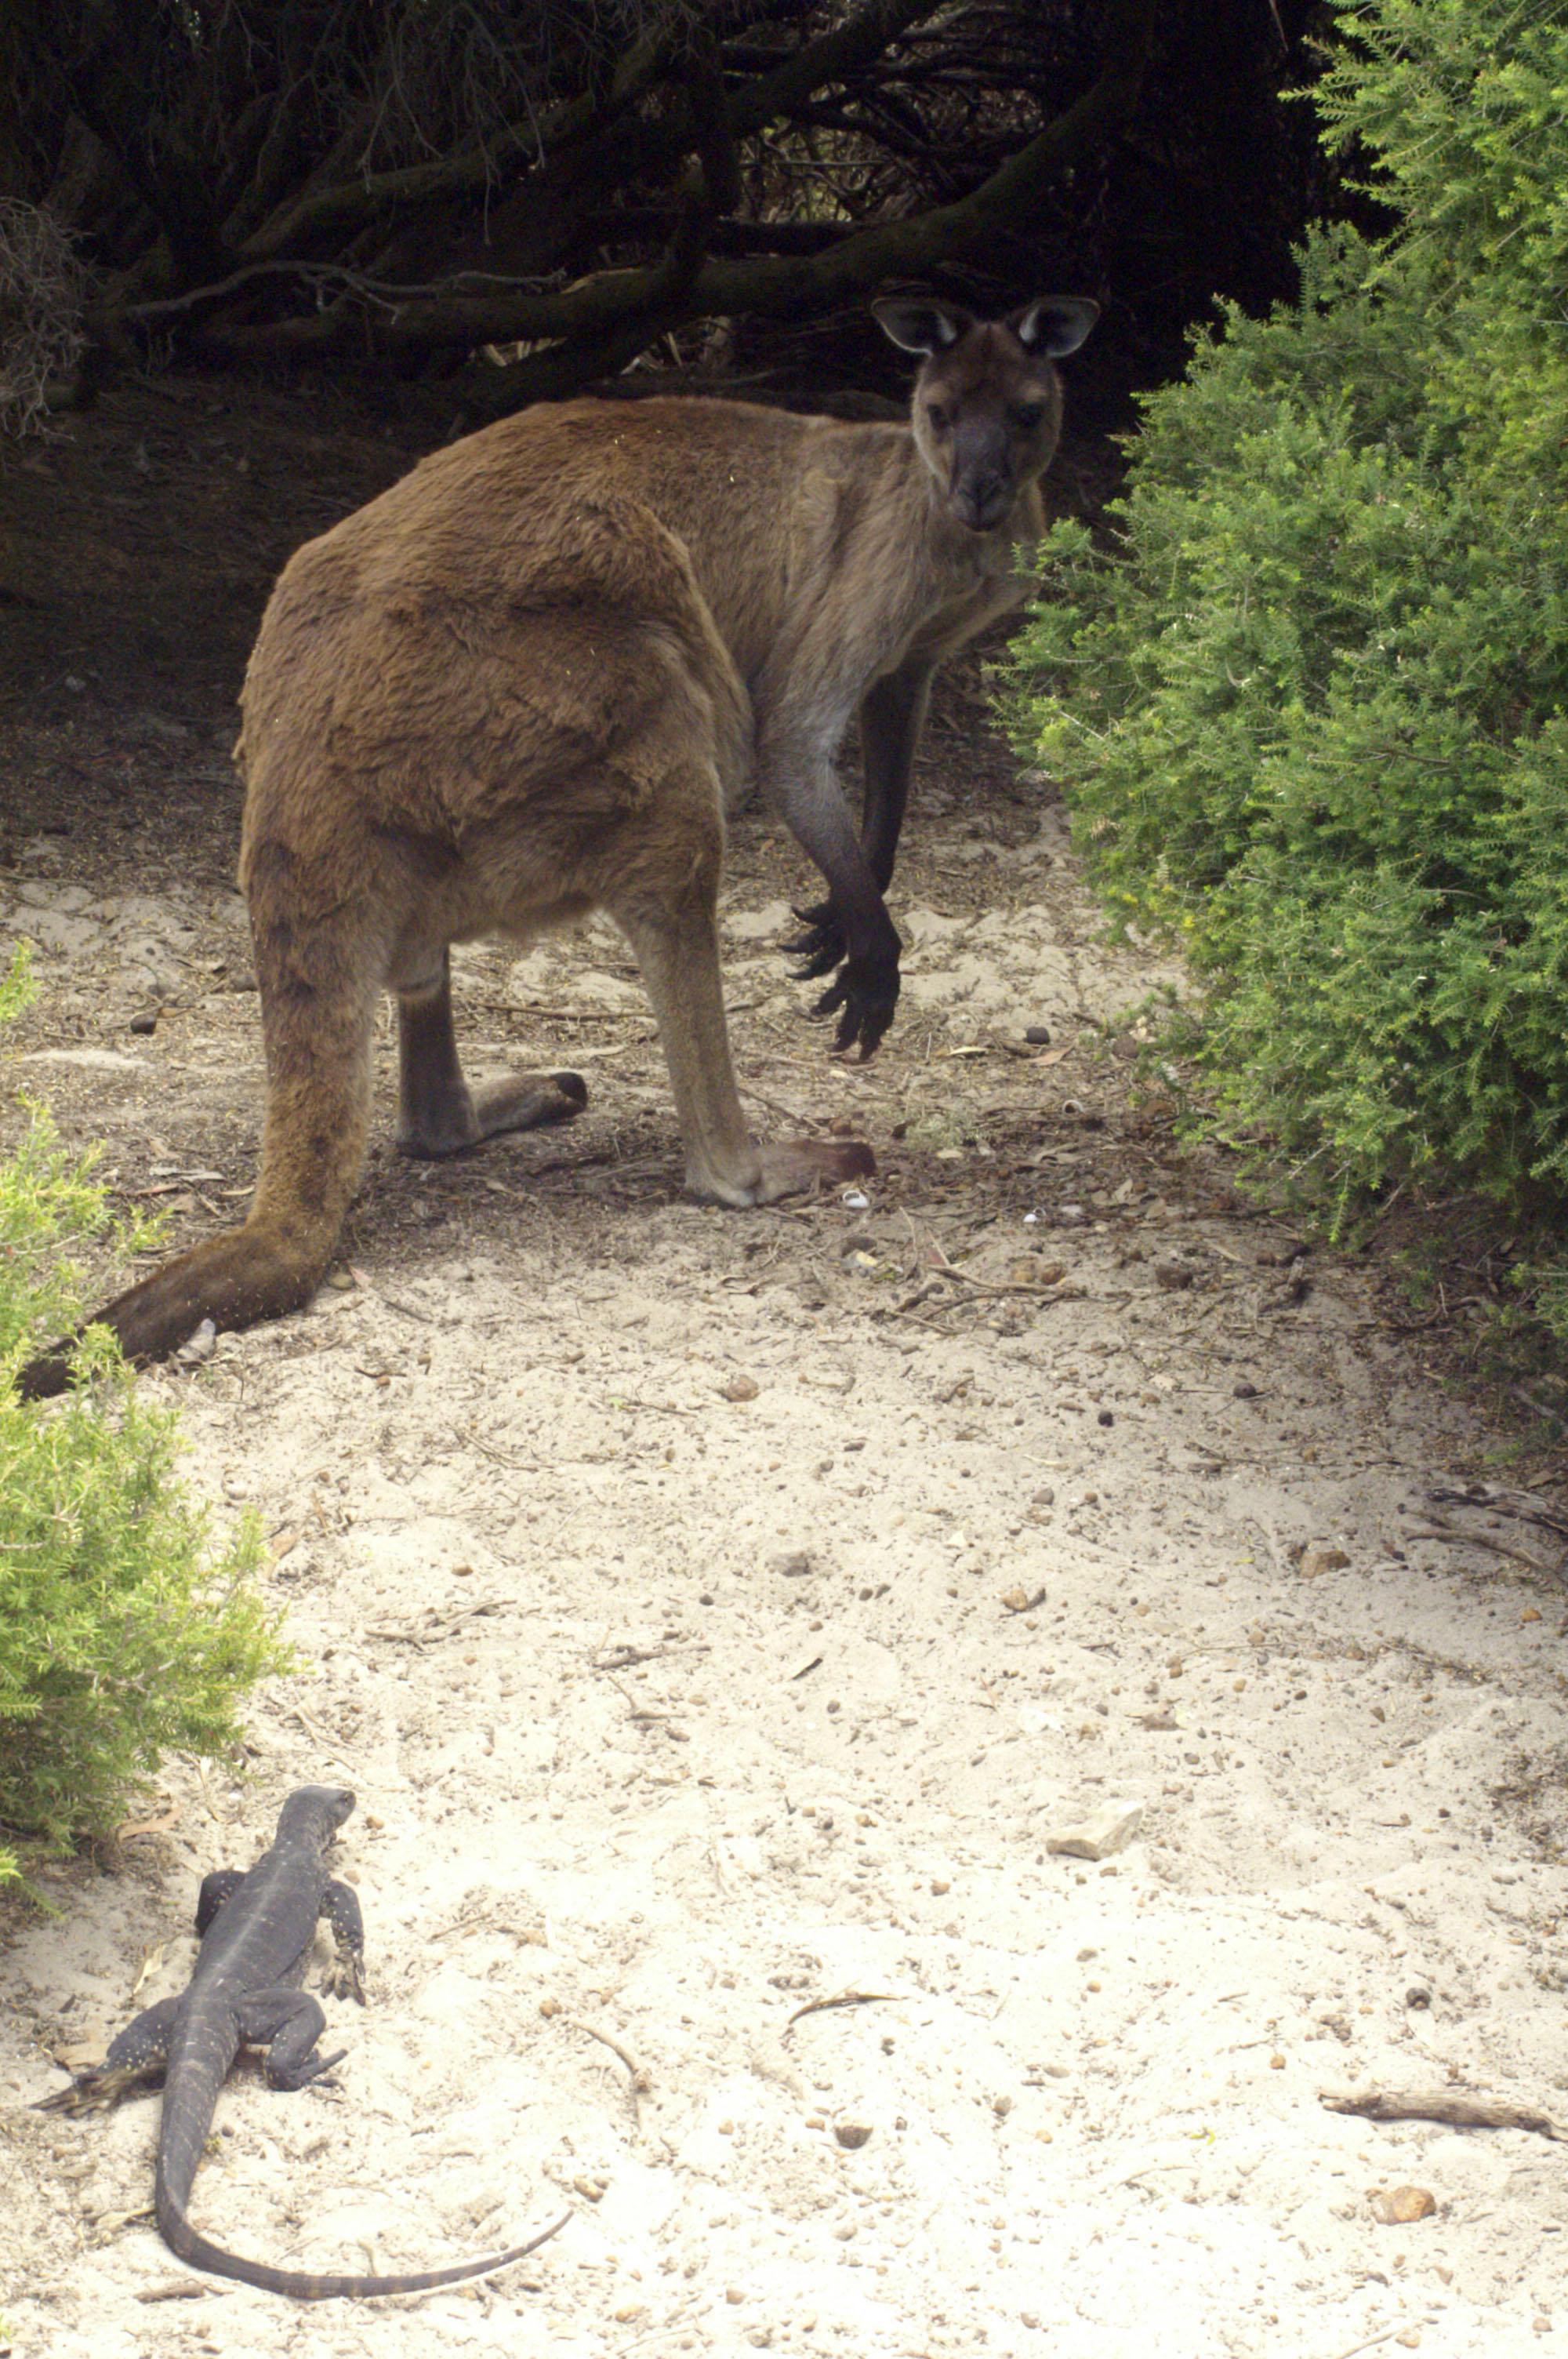 Rare et surprenante rencontre entre iguane et kangourou